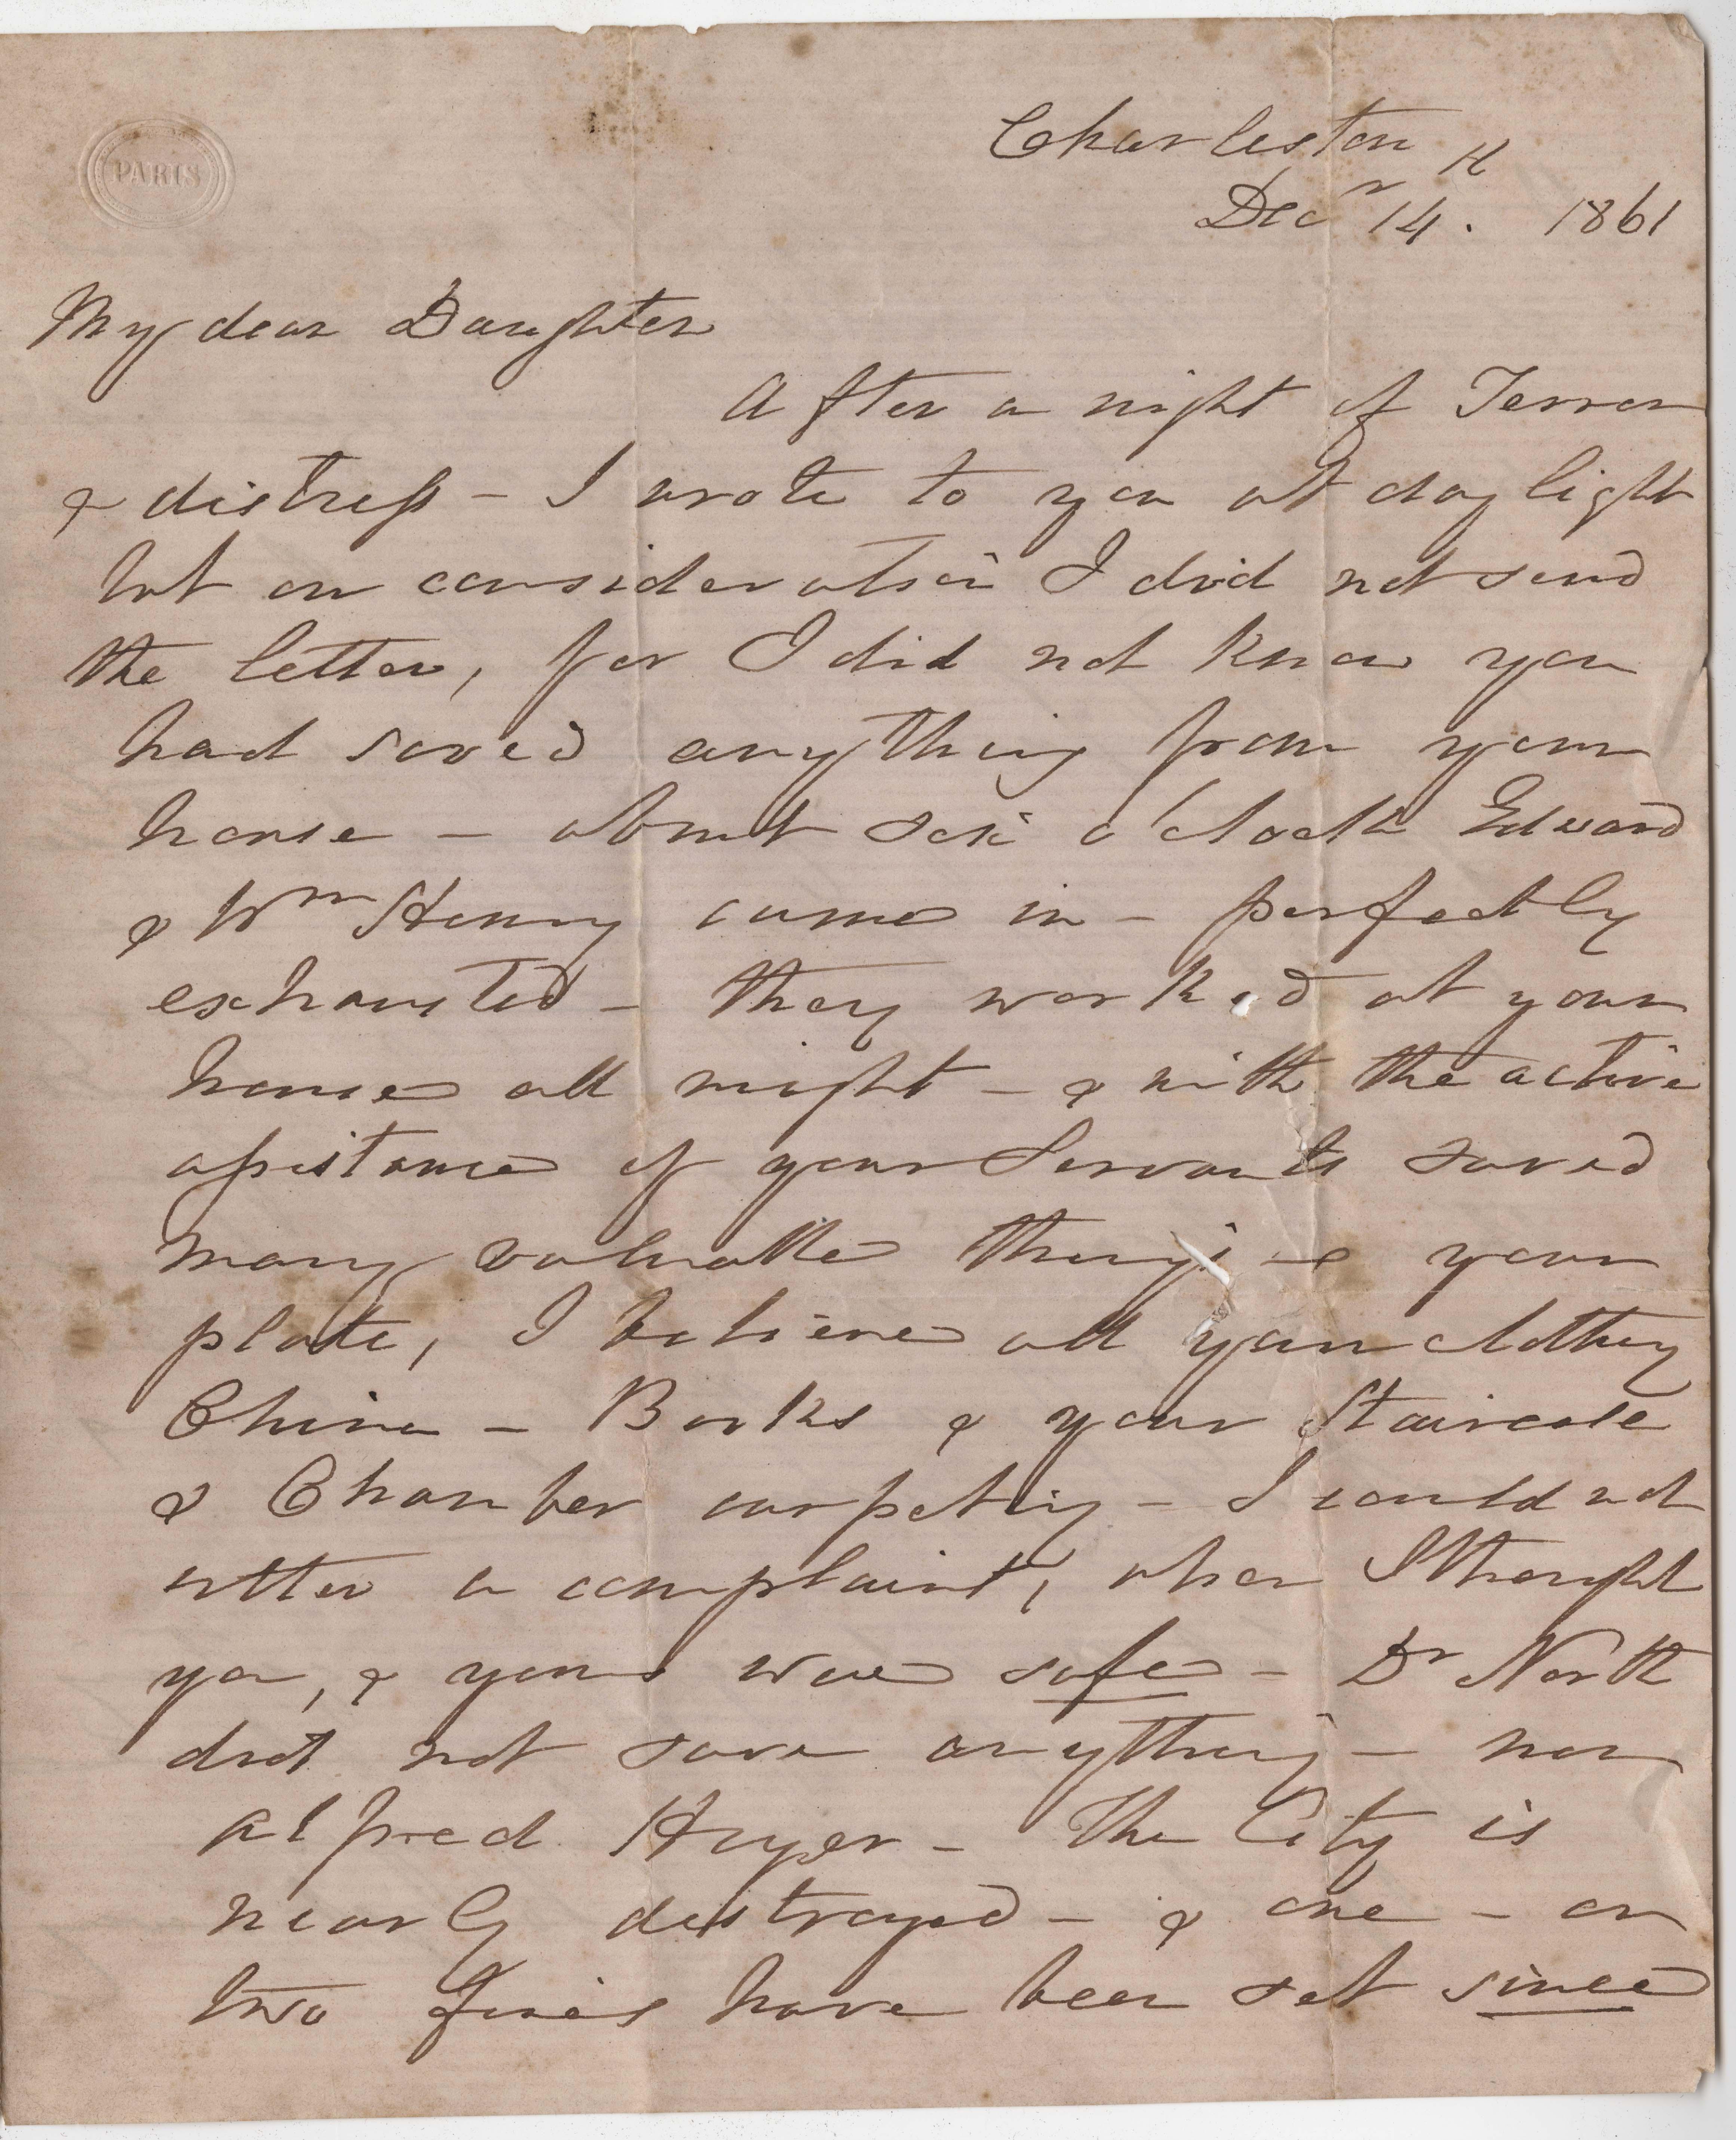 173. Susan S. Keith to Daughter -- December 14, 1861